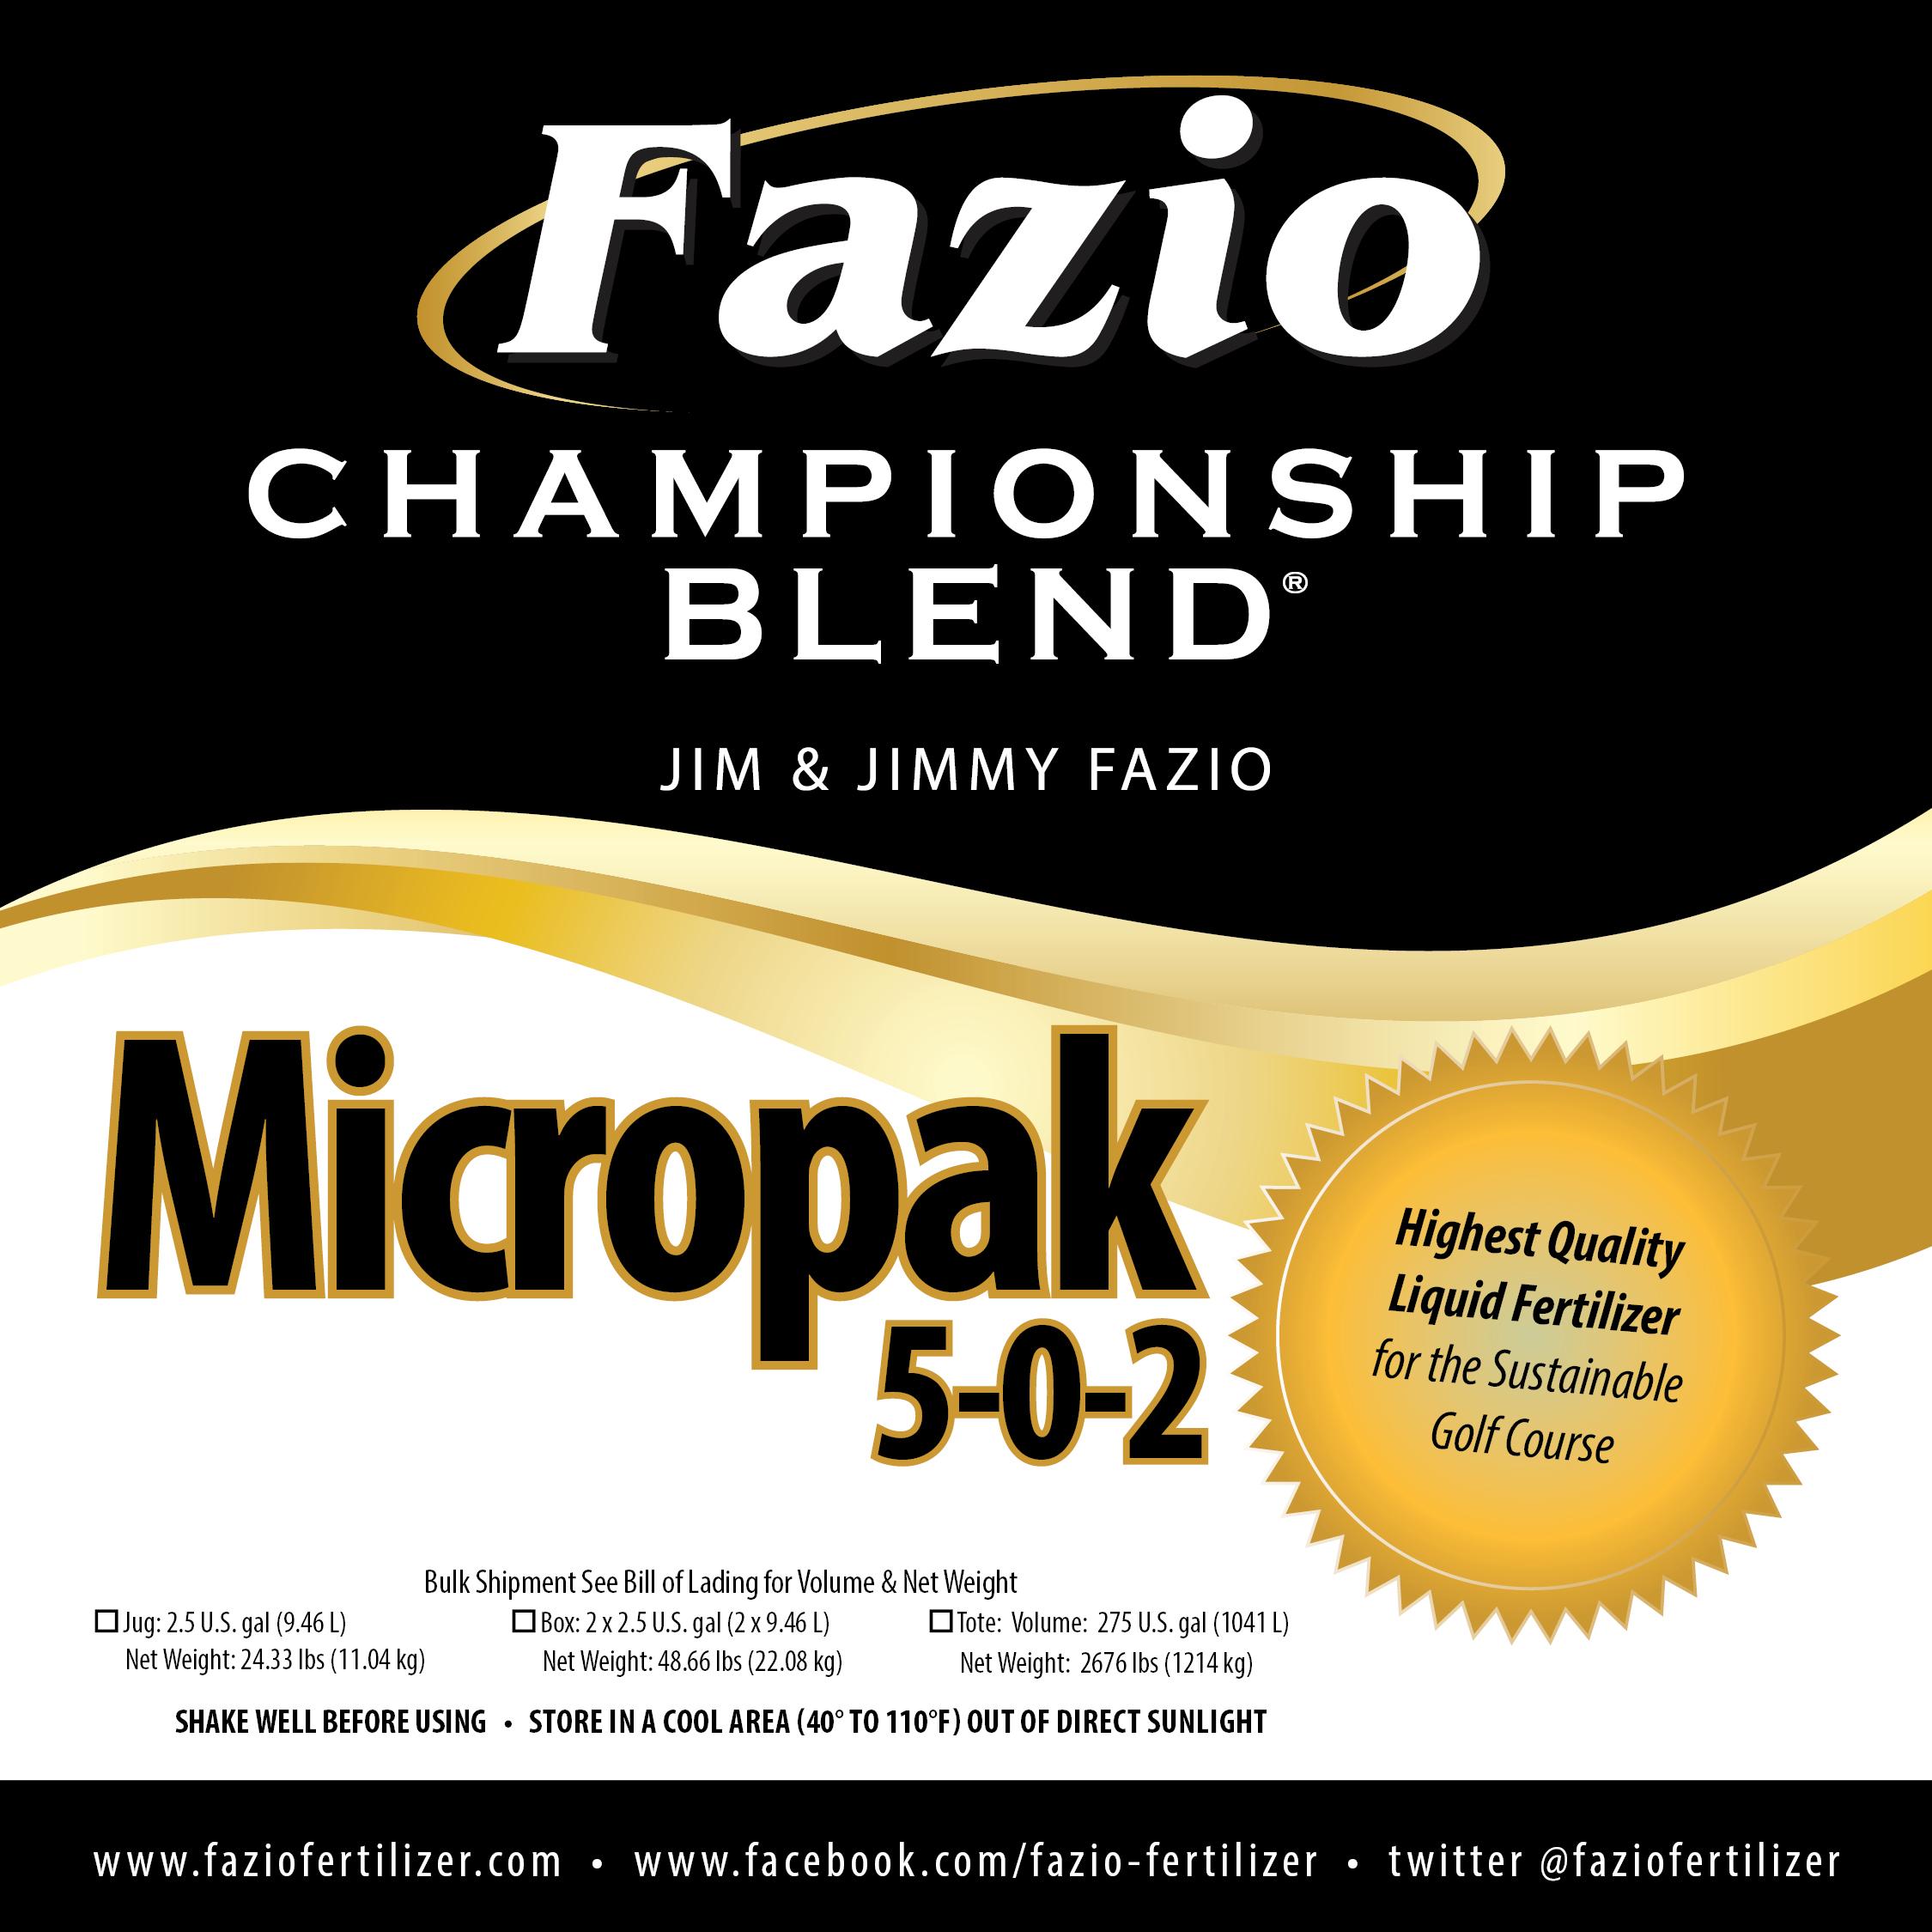 Fazio Championship Blend Micropak 5-0-2